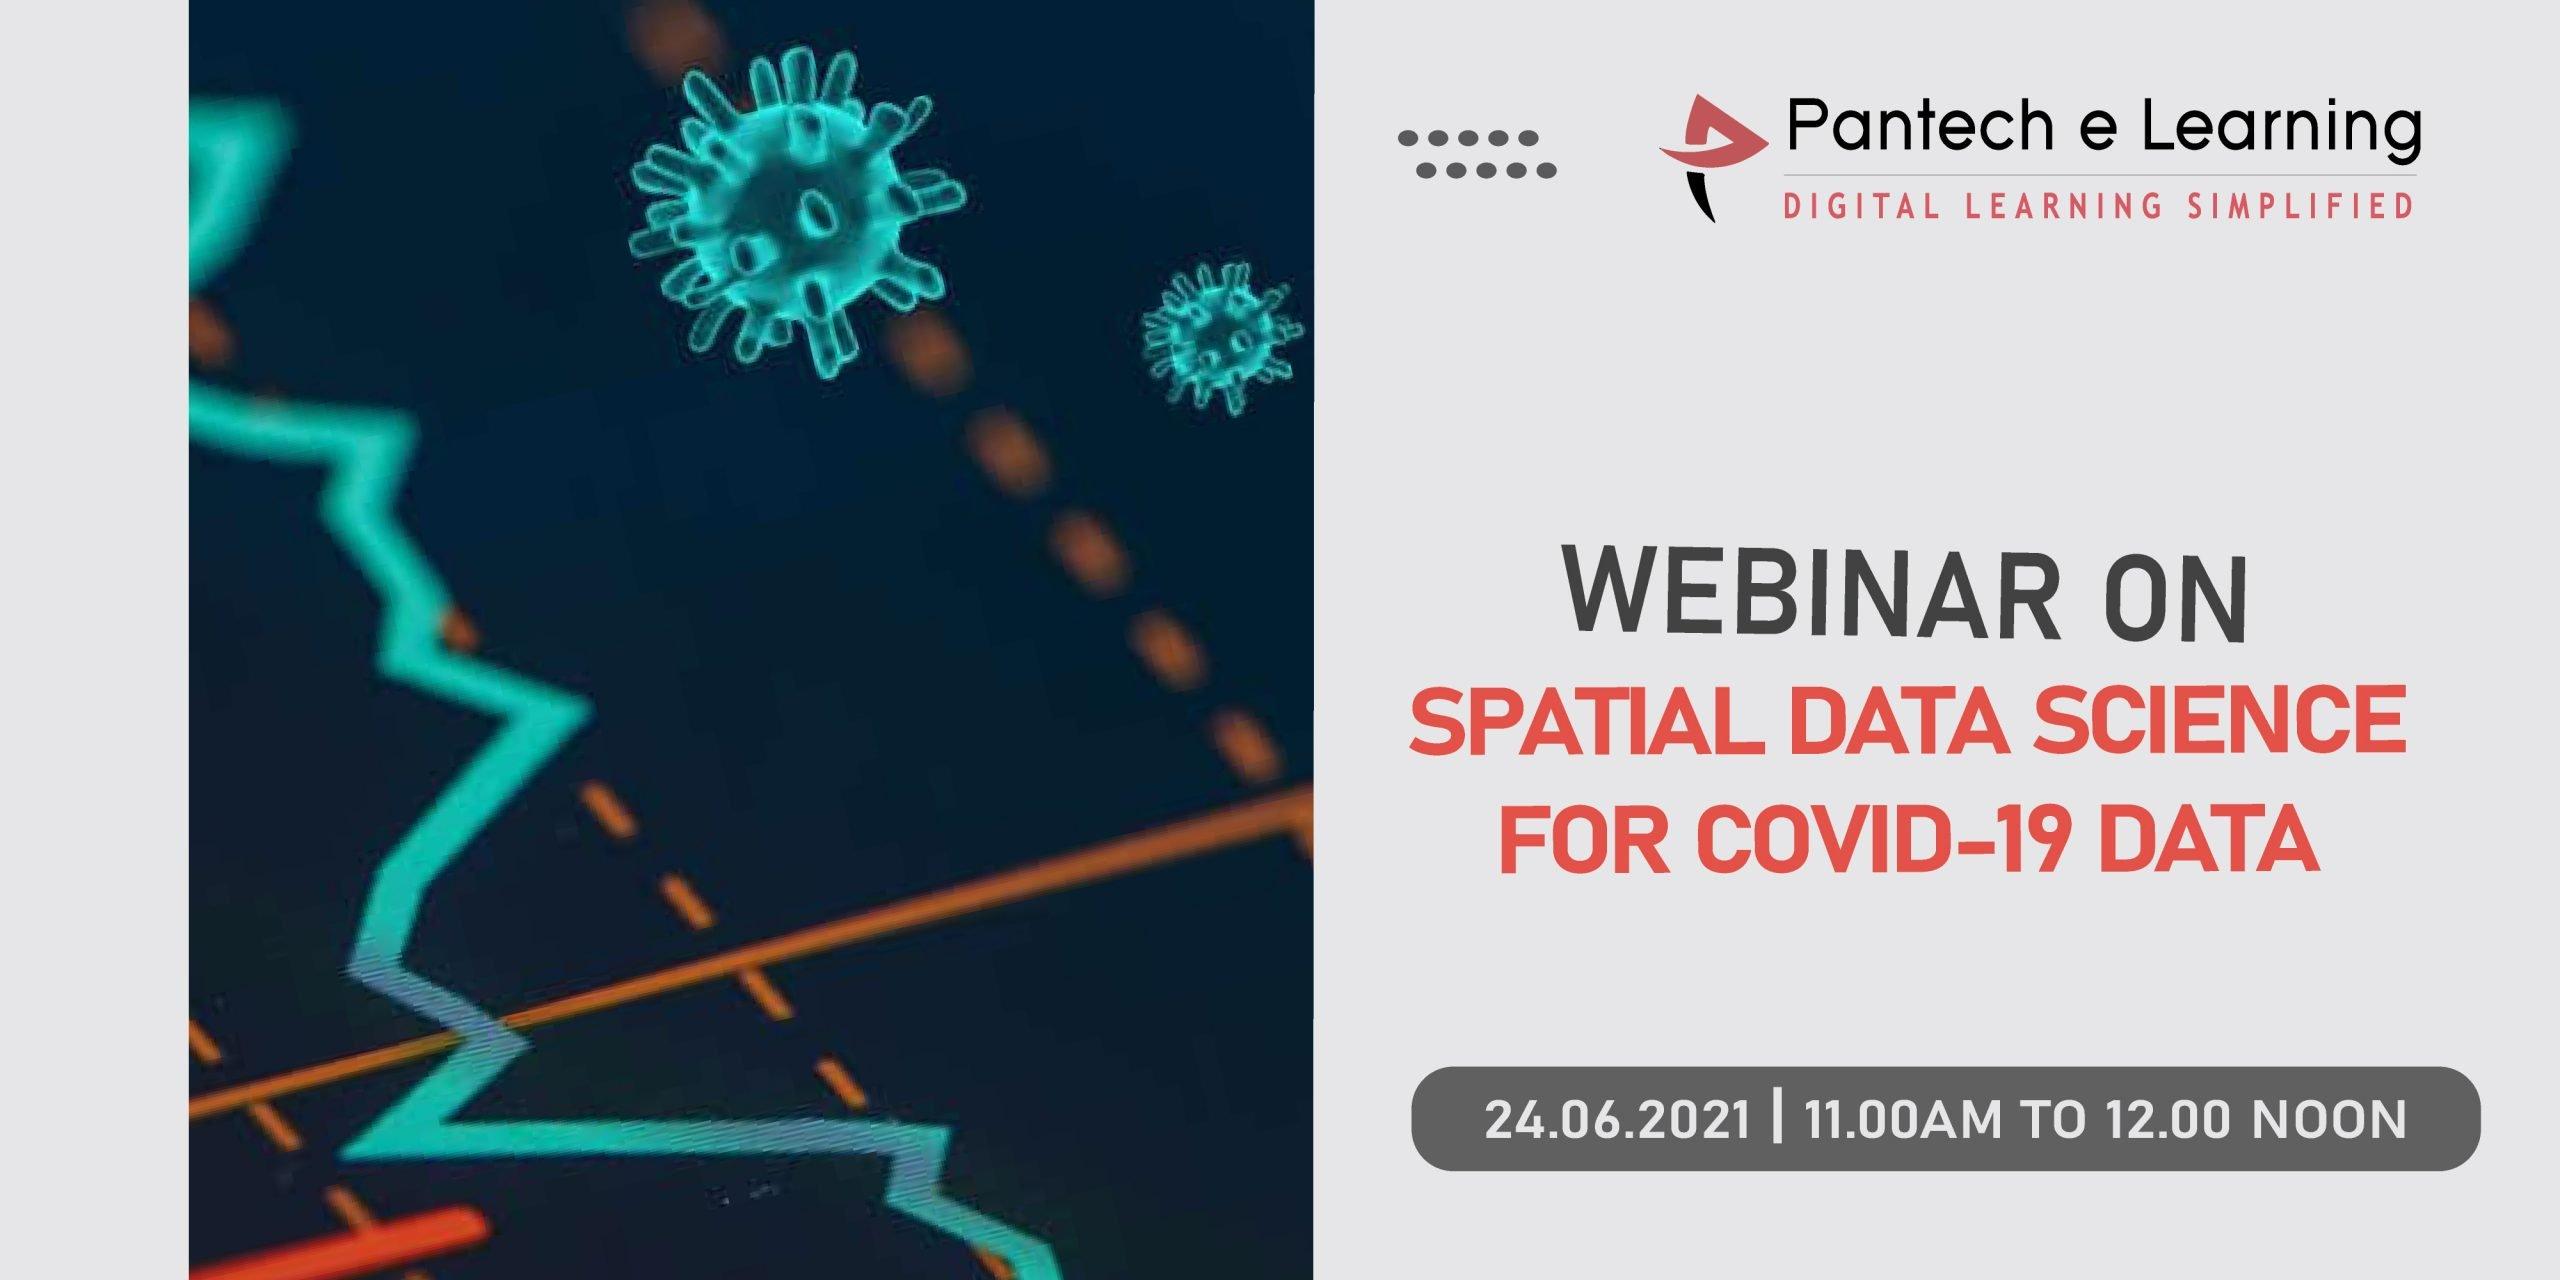 Datascience for Covid 19 Rajalakshmi institute Pantech eLearning 1